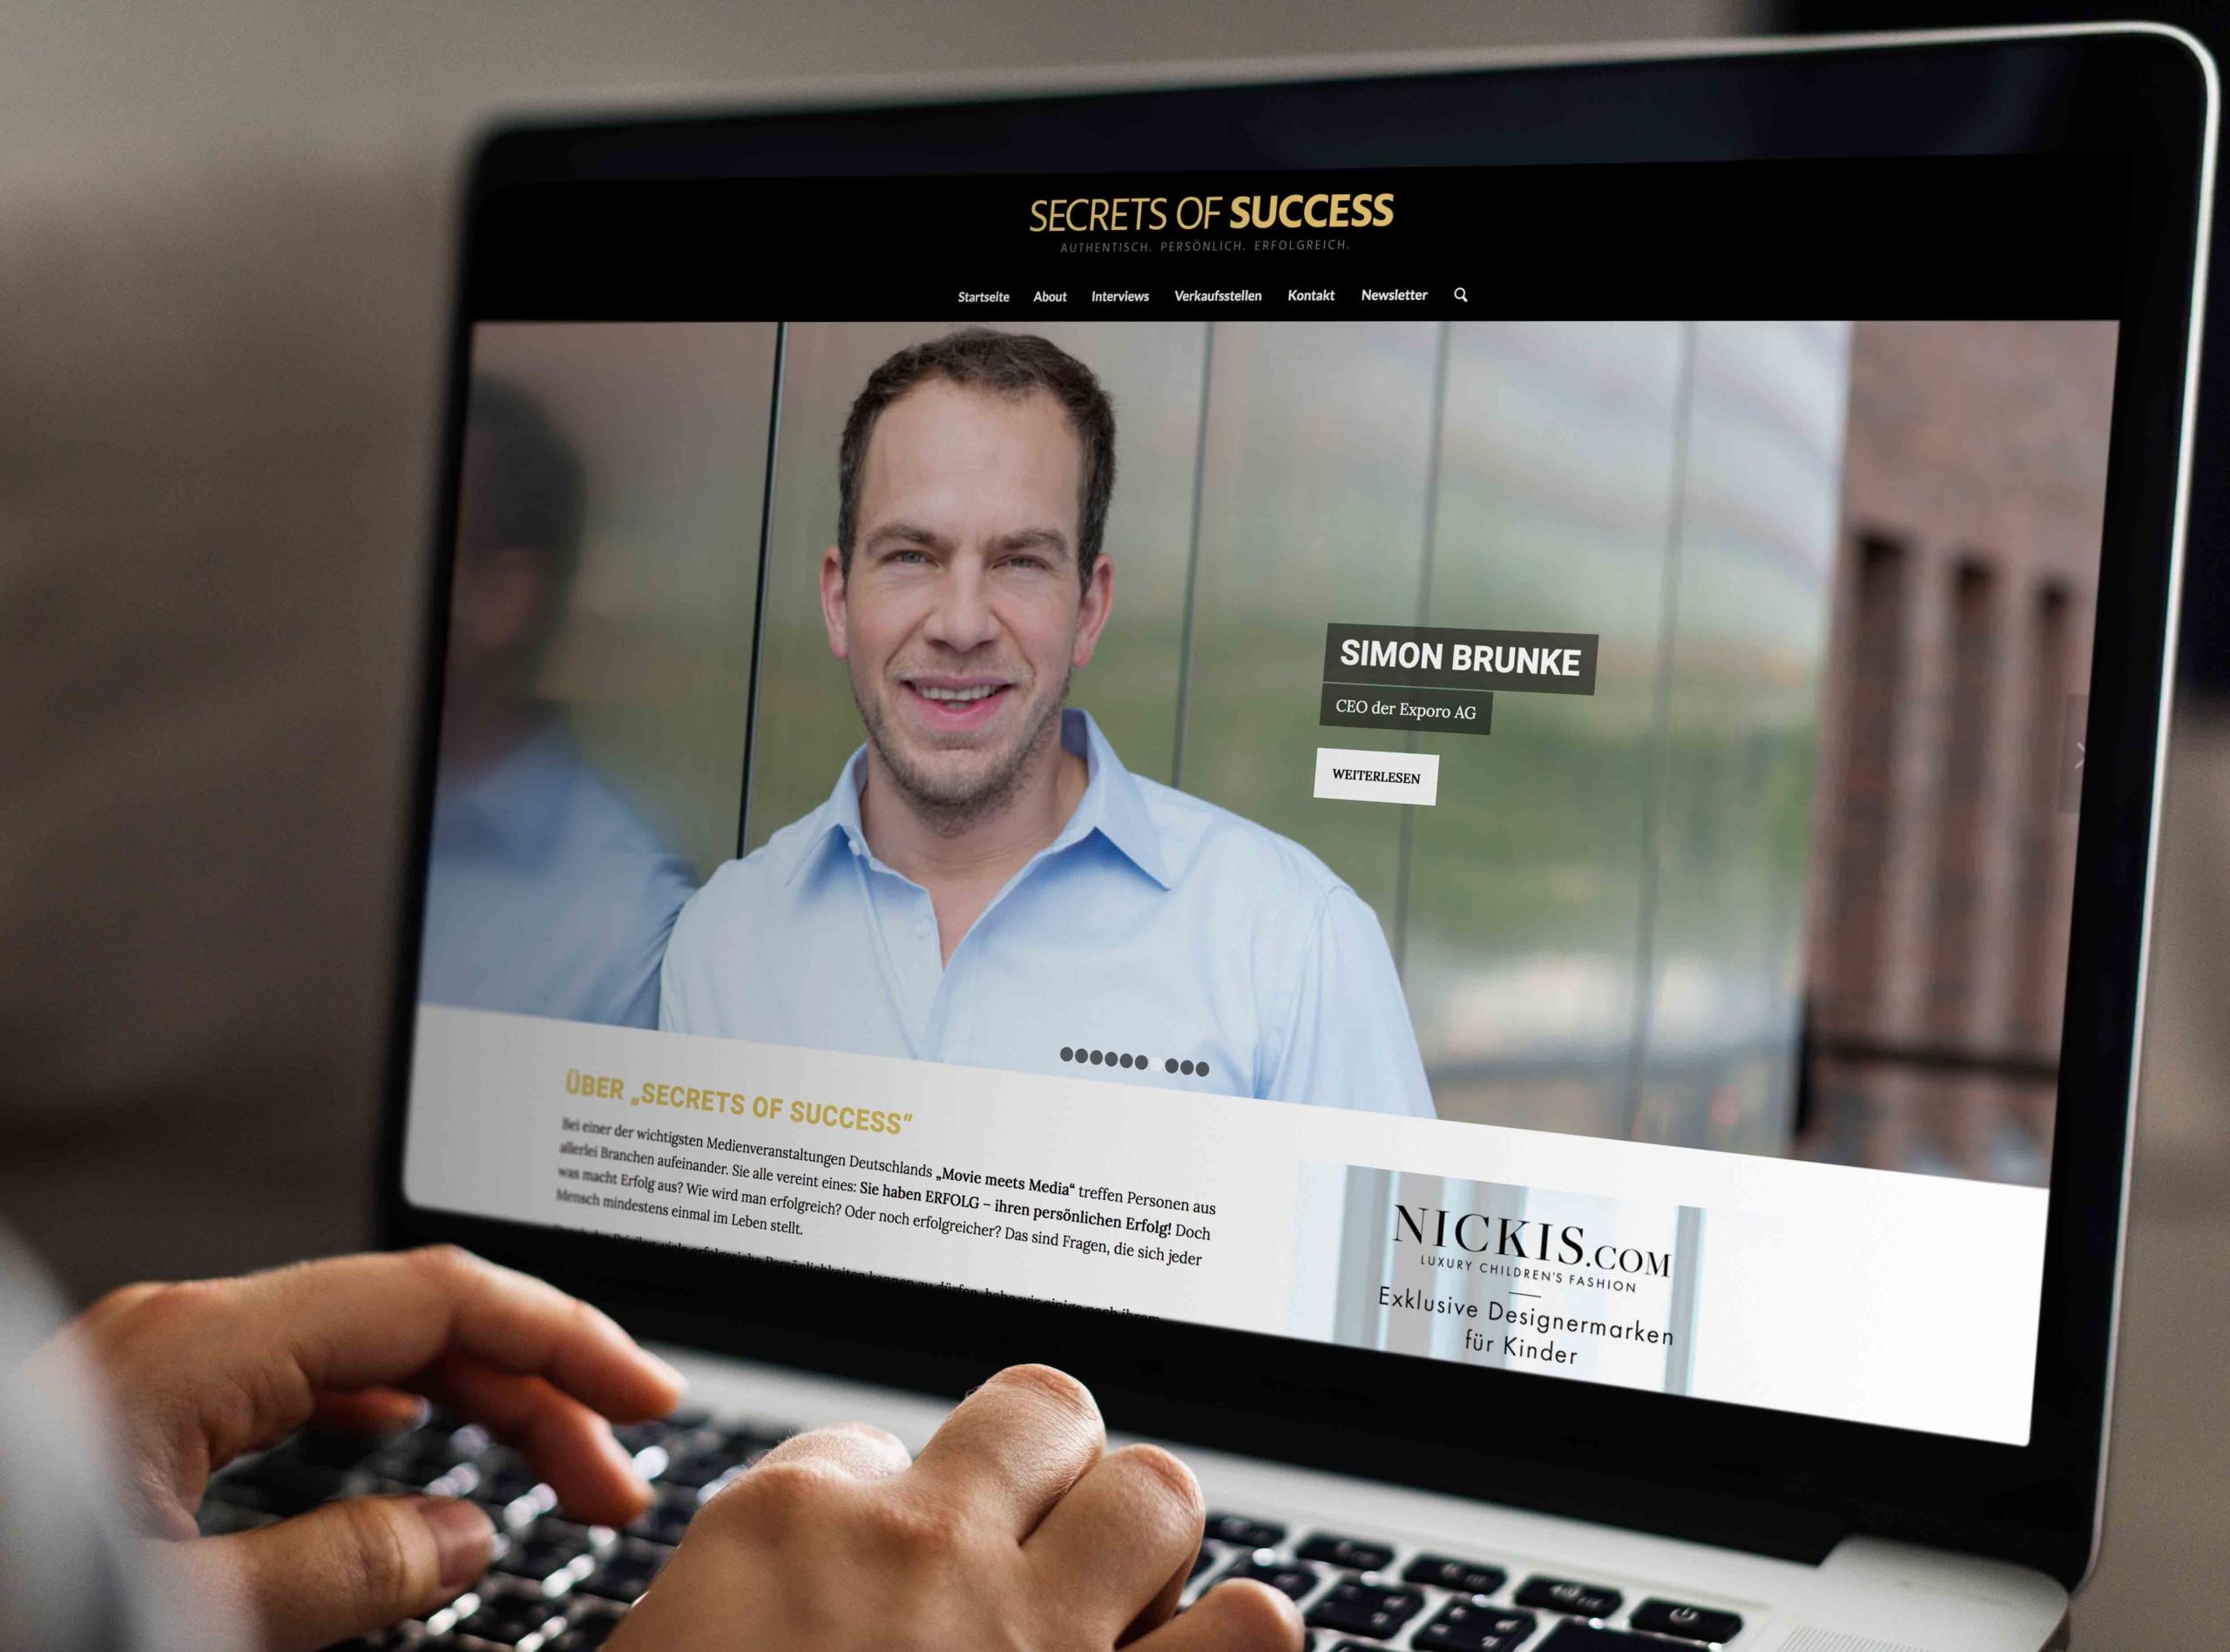 Secrets of Success Website